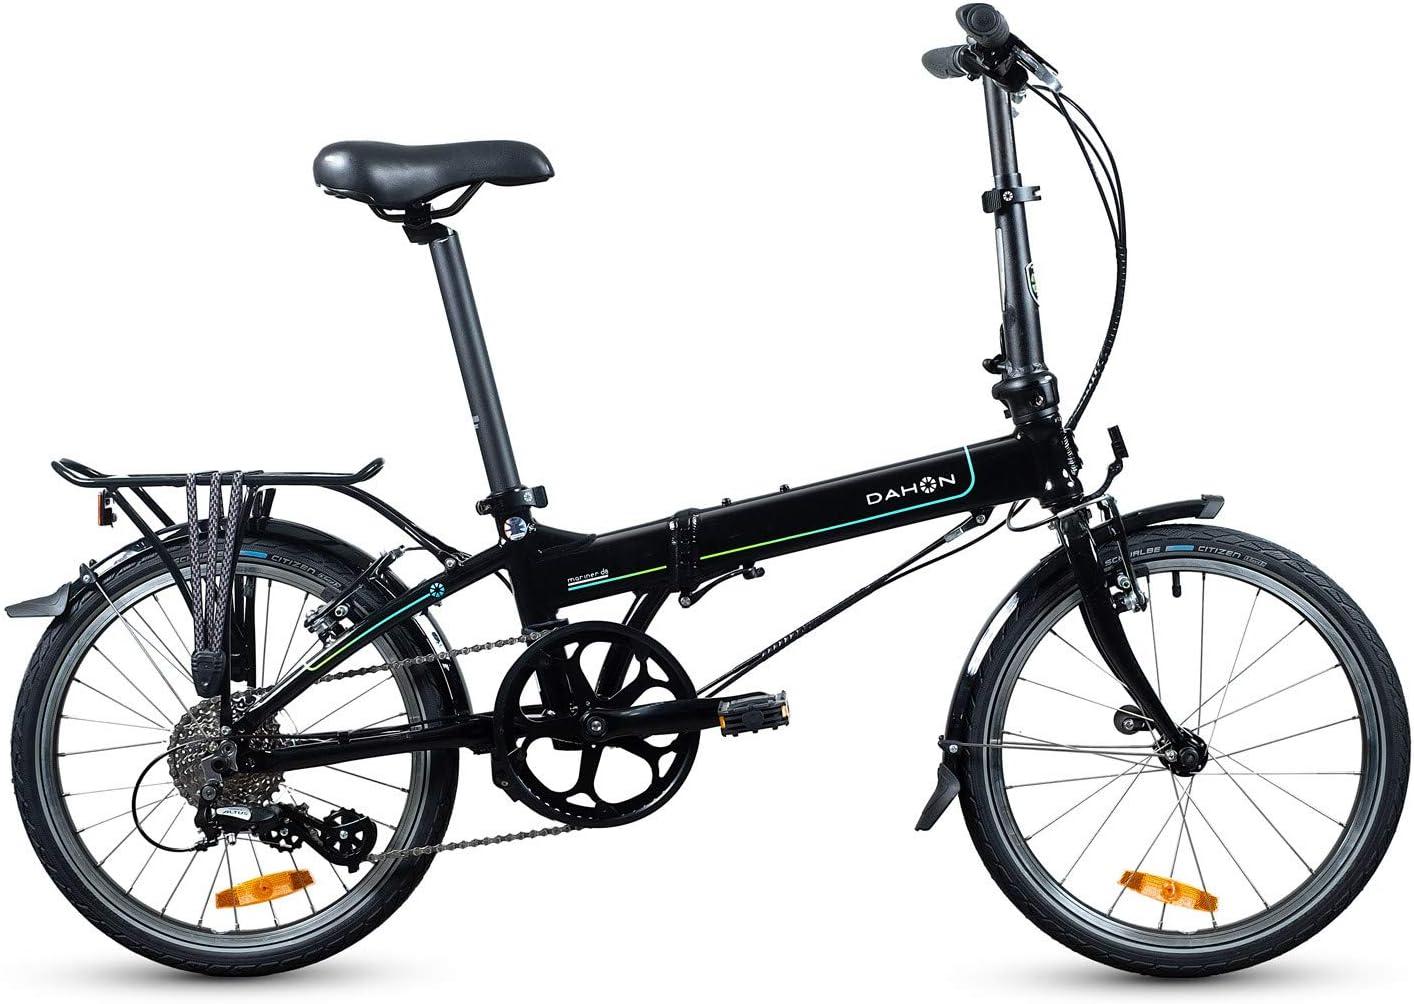 Dahon Bicicleta Plegable Mariner D8 Color Negro, Adultos Unisex ...